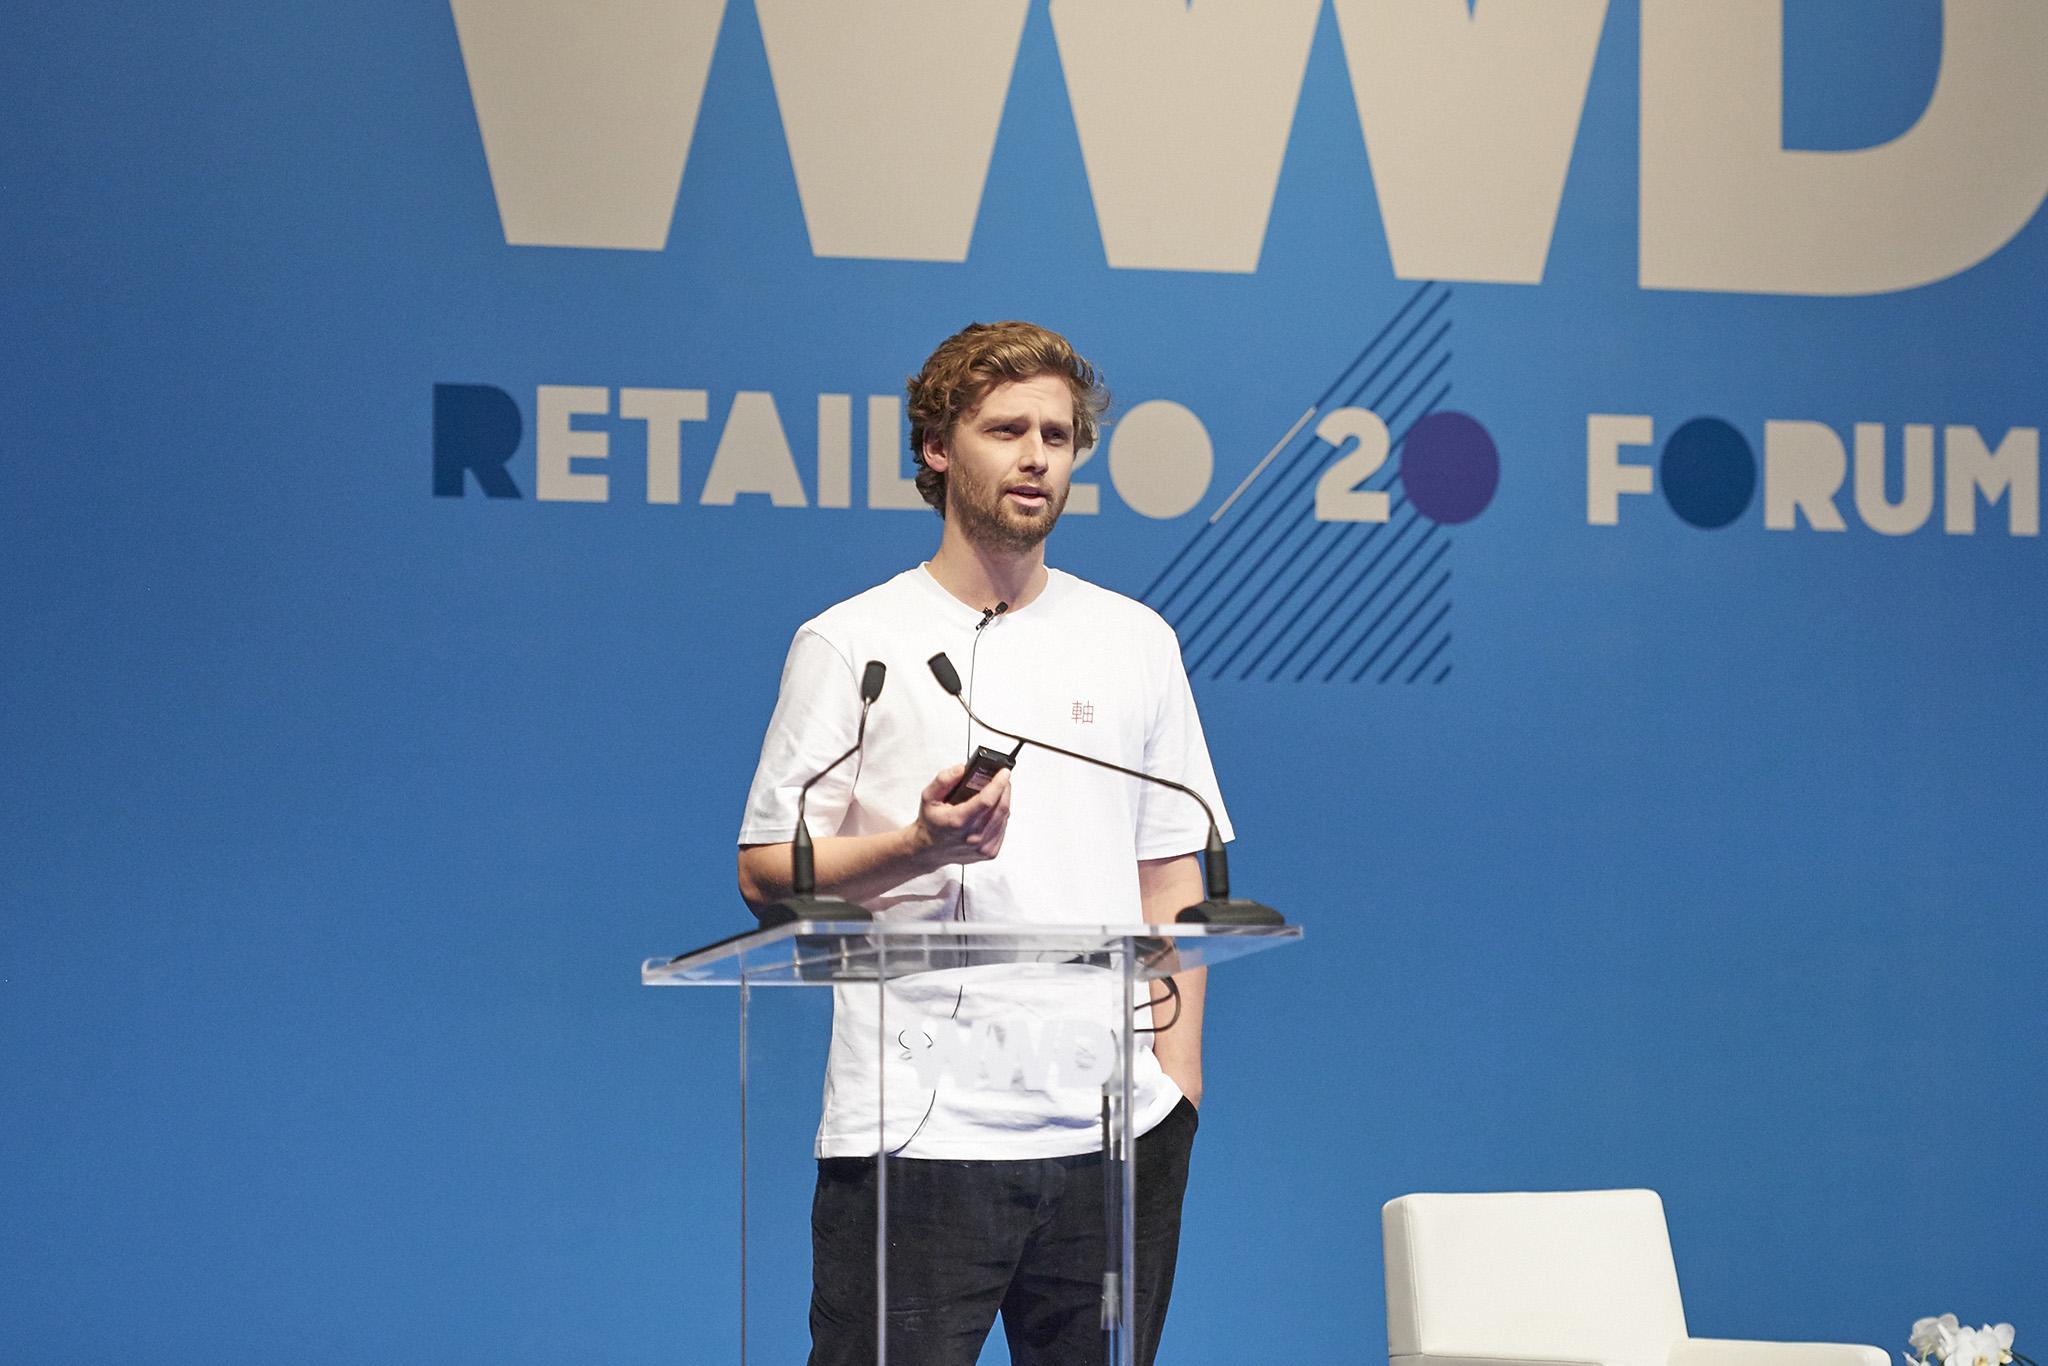 Albin Johansson speaking at WWD's inaugural Tokyo summit in partnership with Lumine.